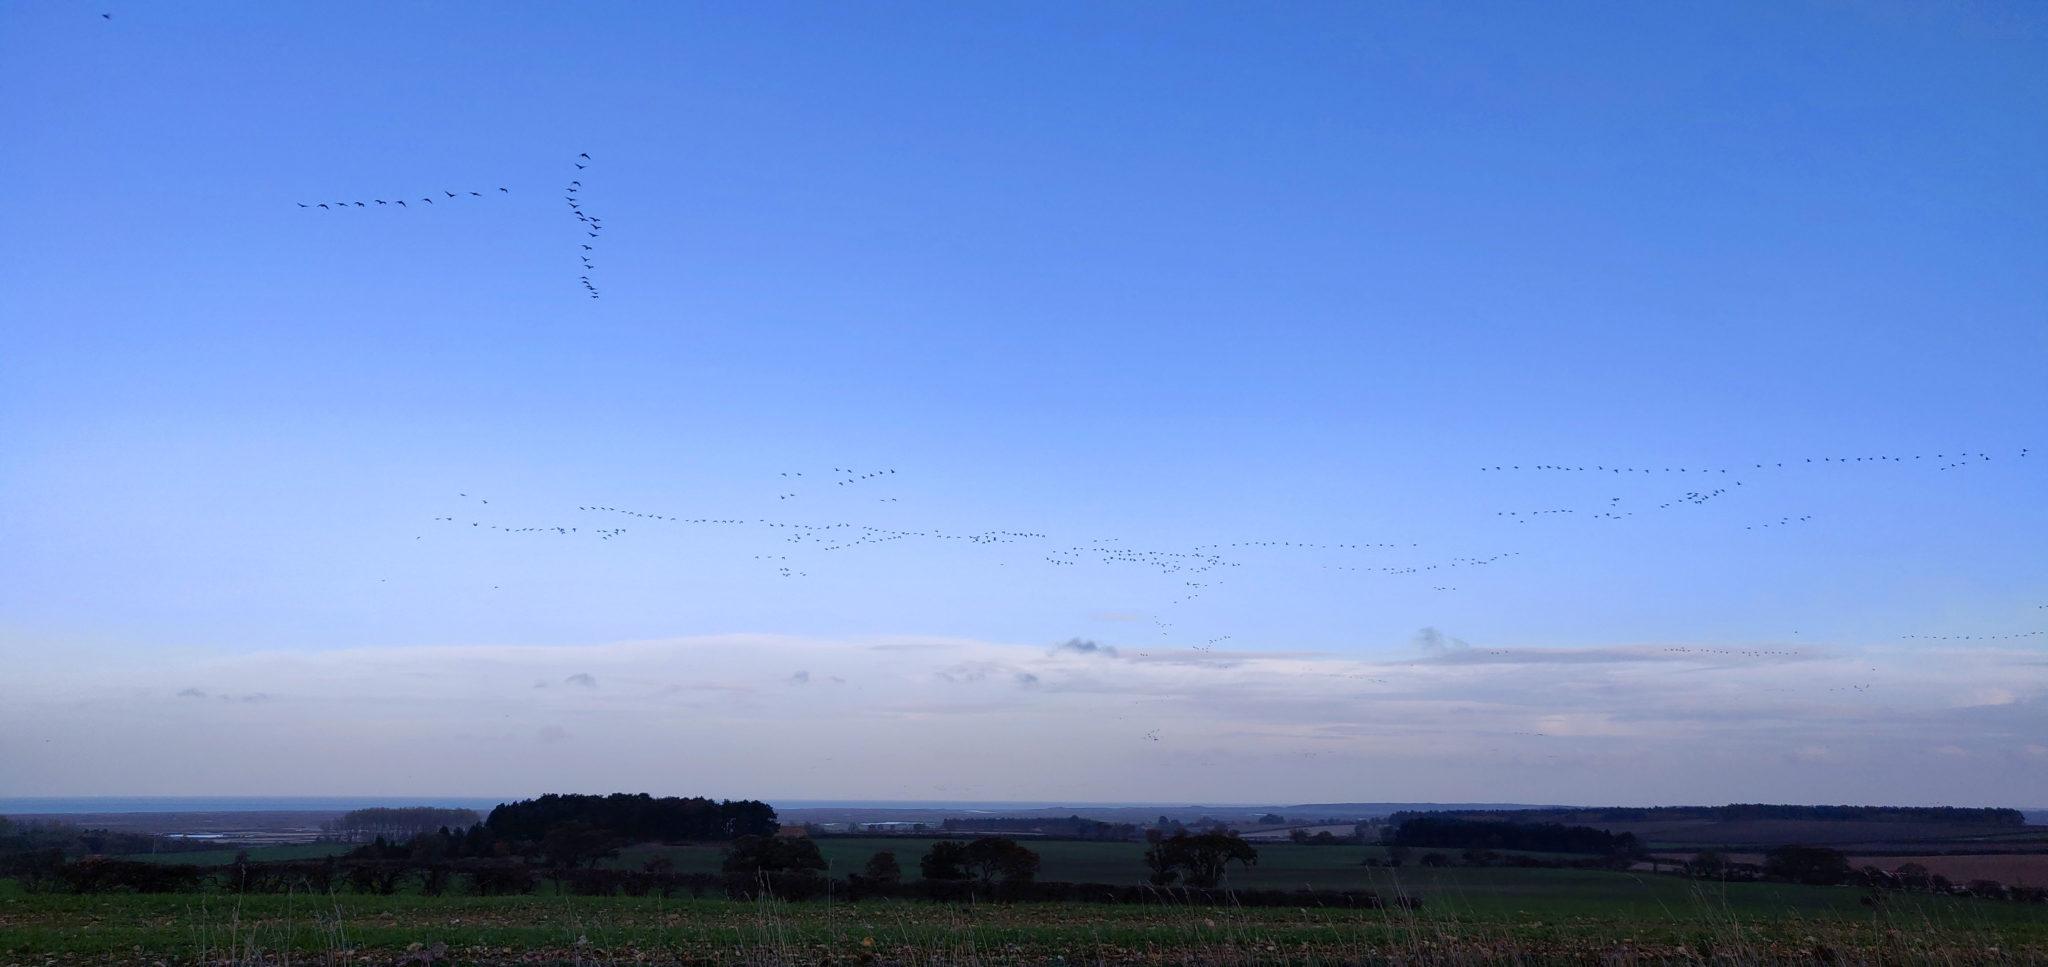 Geese fly over Burnham Deepdale